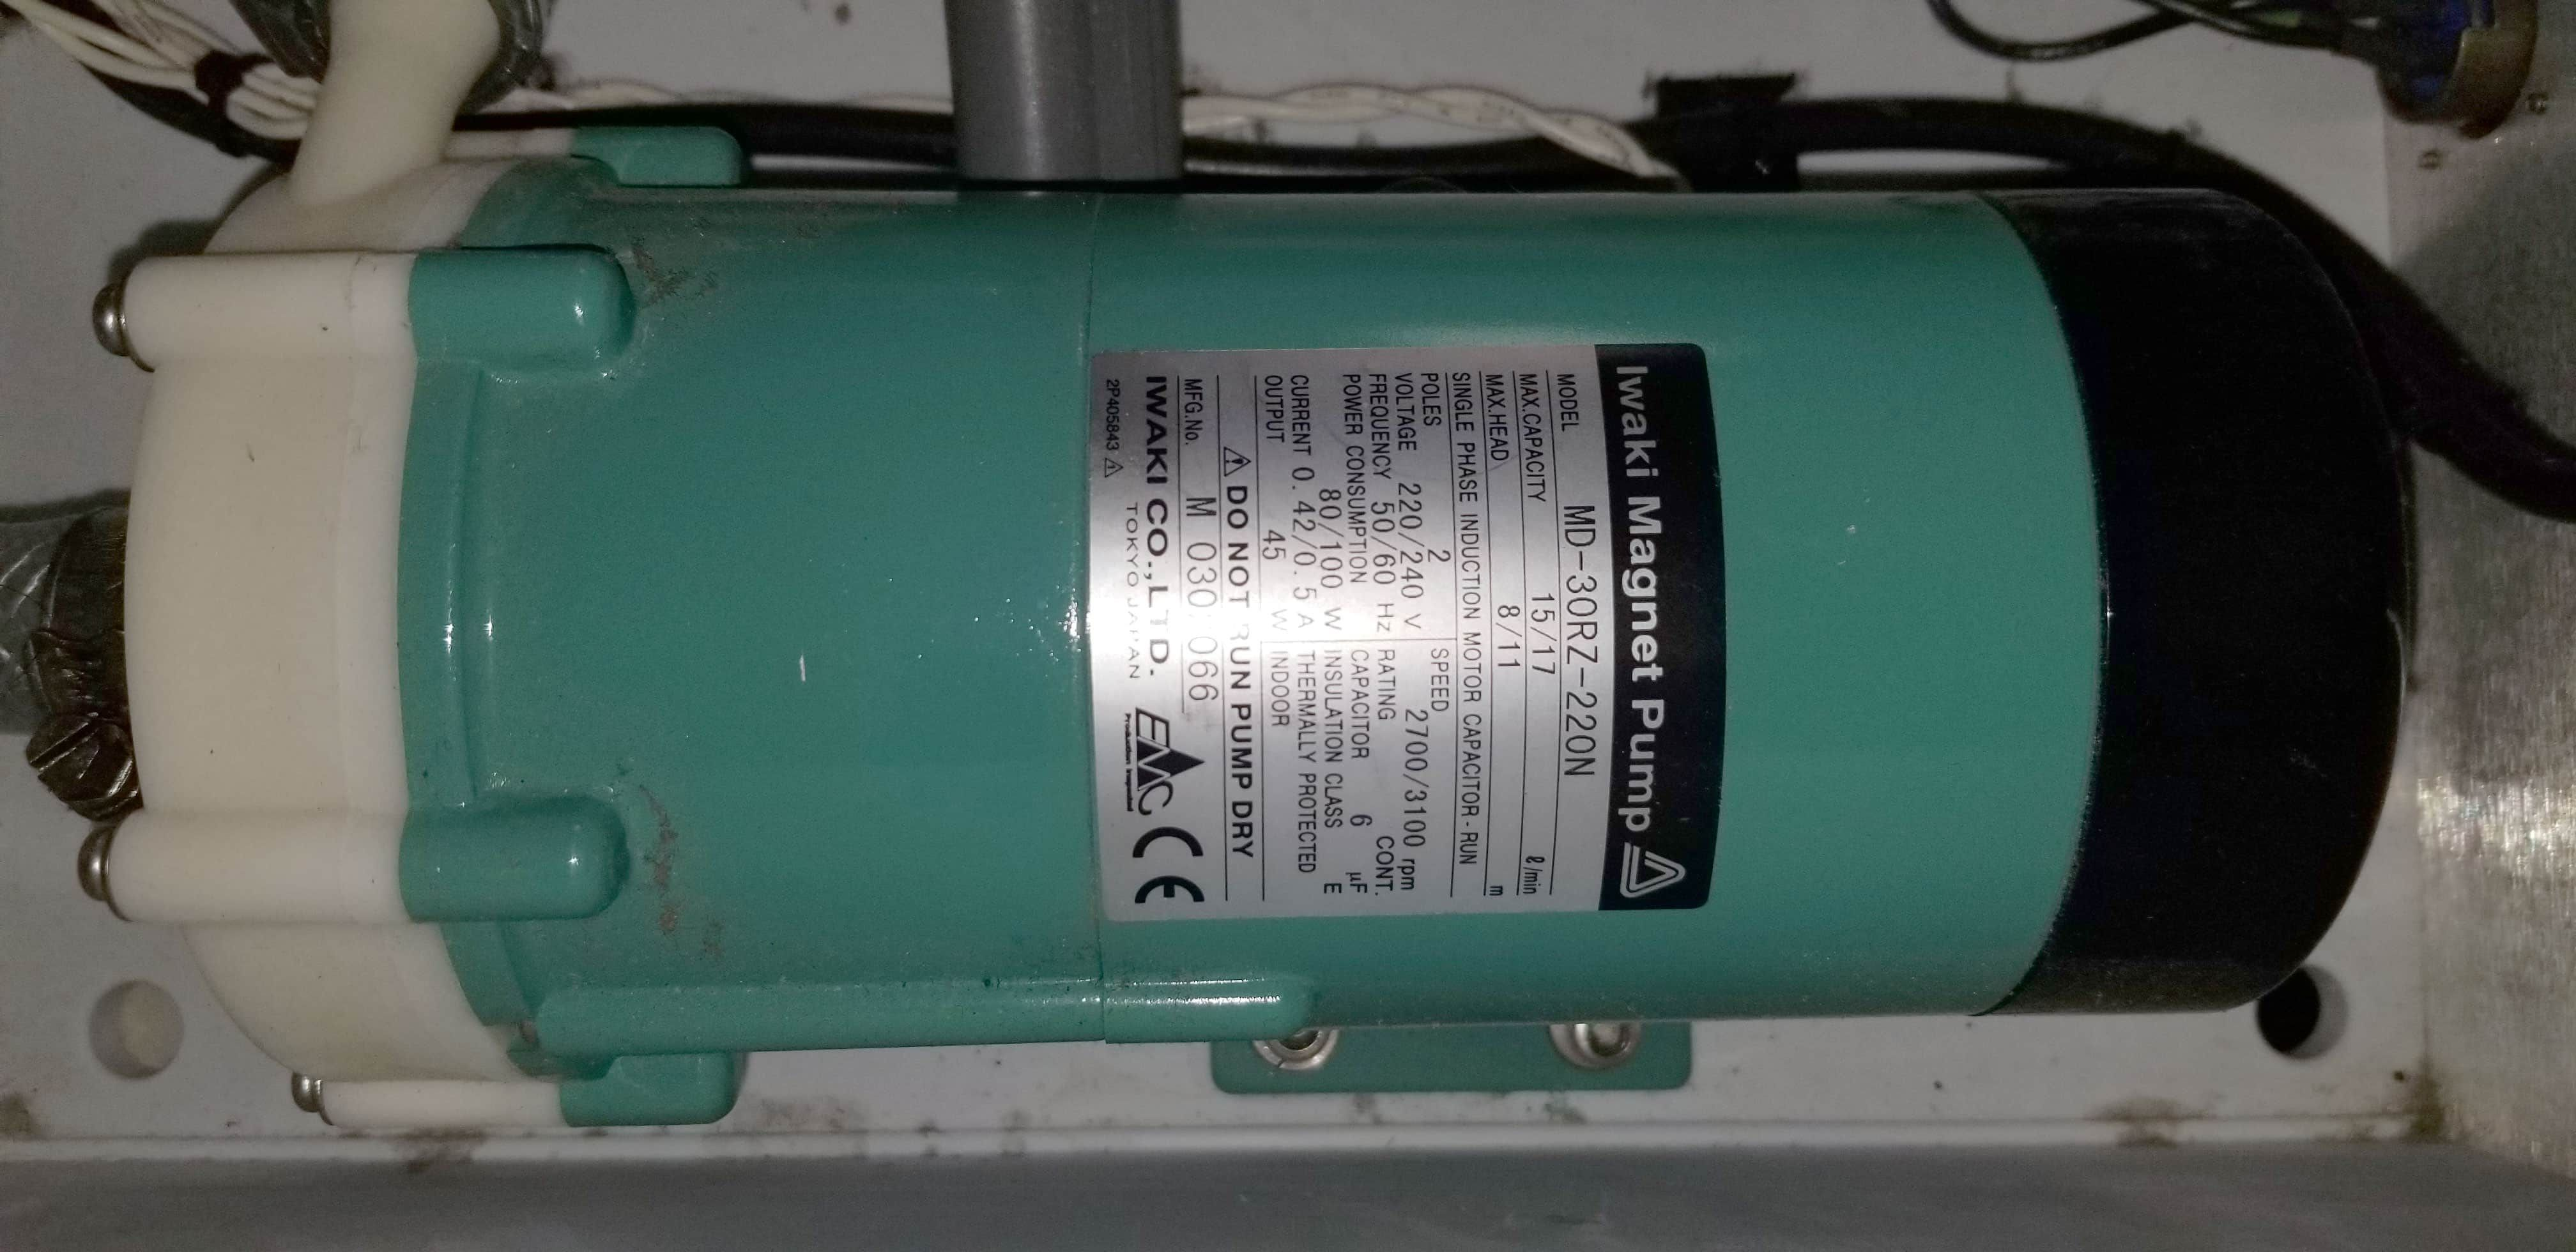 Positive Light / Coherent : Laser Cooling System : LCS 3000